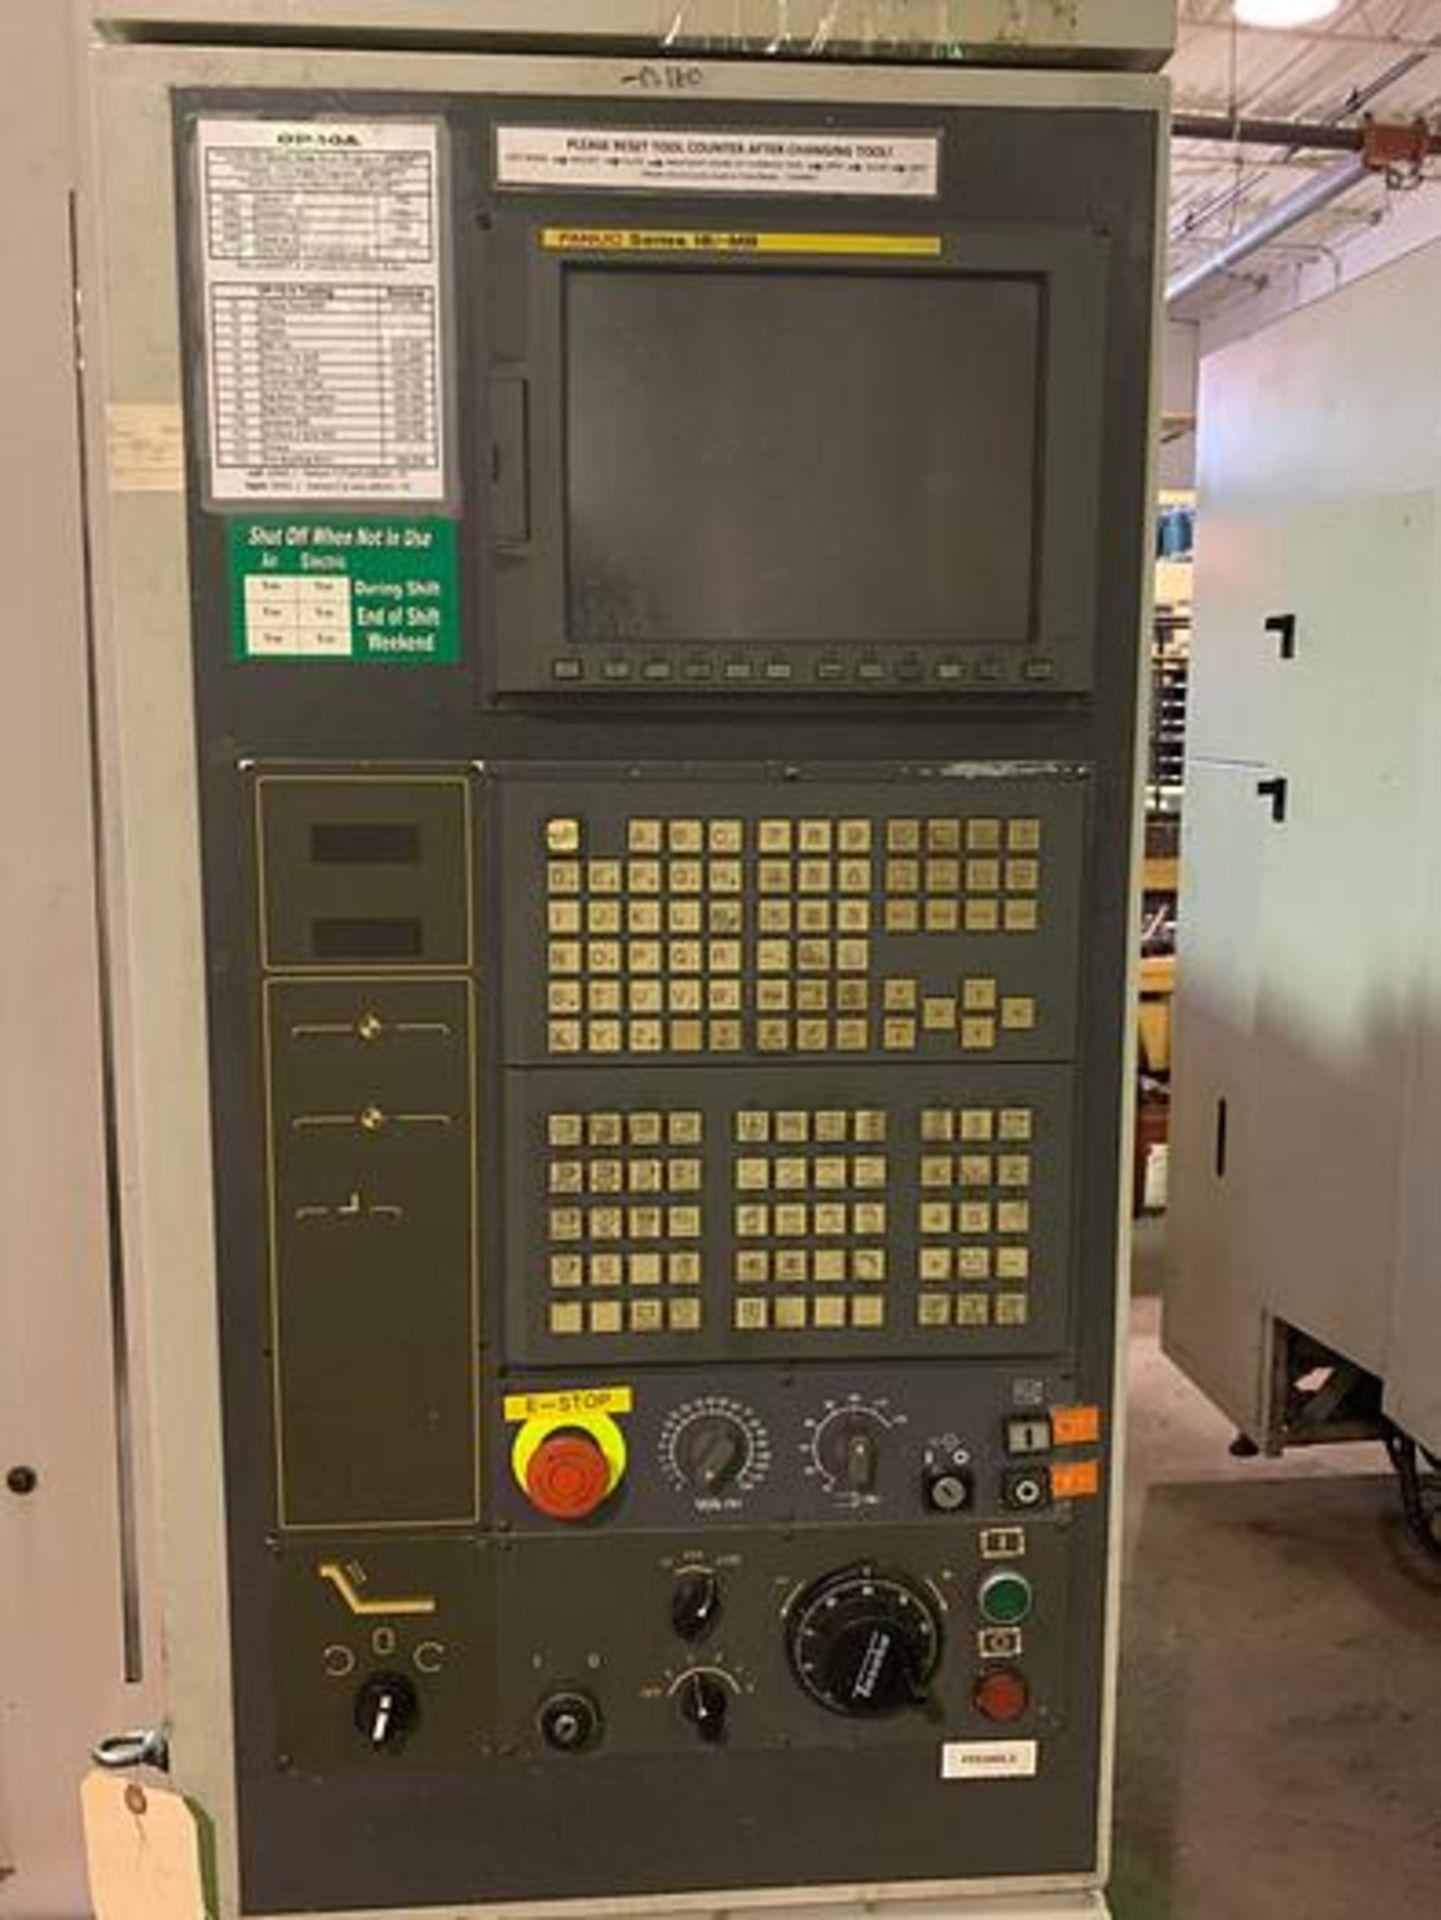 "HARDINGE BRIDGEPORT XR760 CNC VMC PRODUCTION CENTER 30""X24""X24"". YEAR 2007, SN 310D418 - Image 3 of 16"